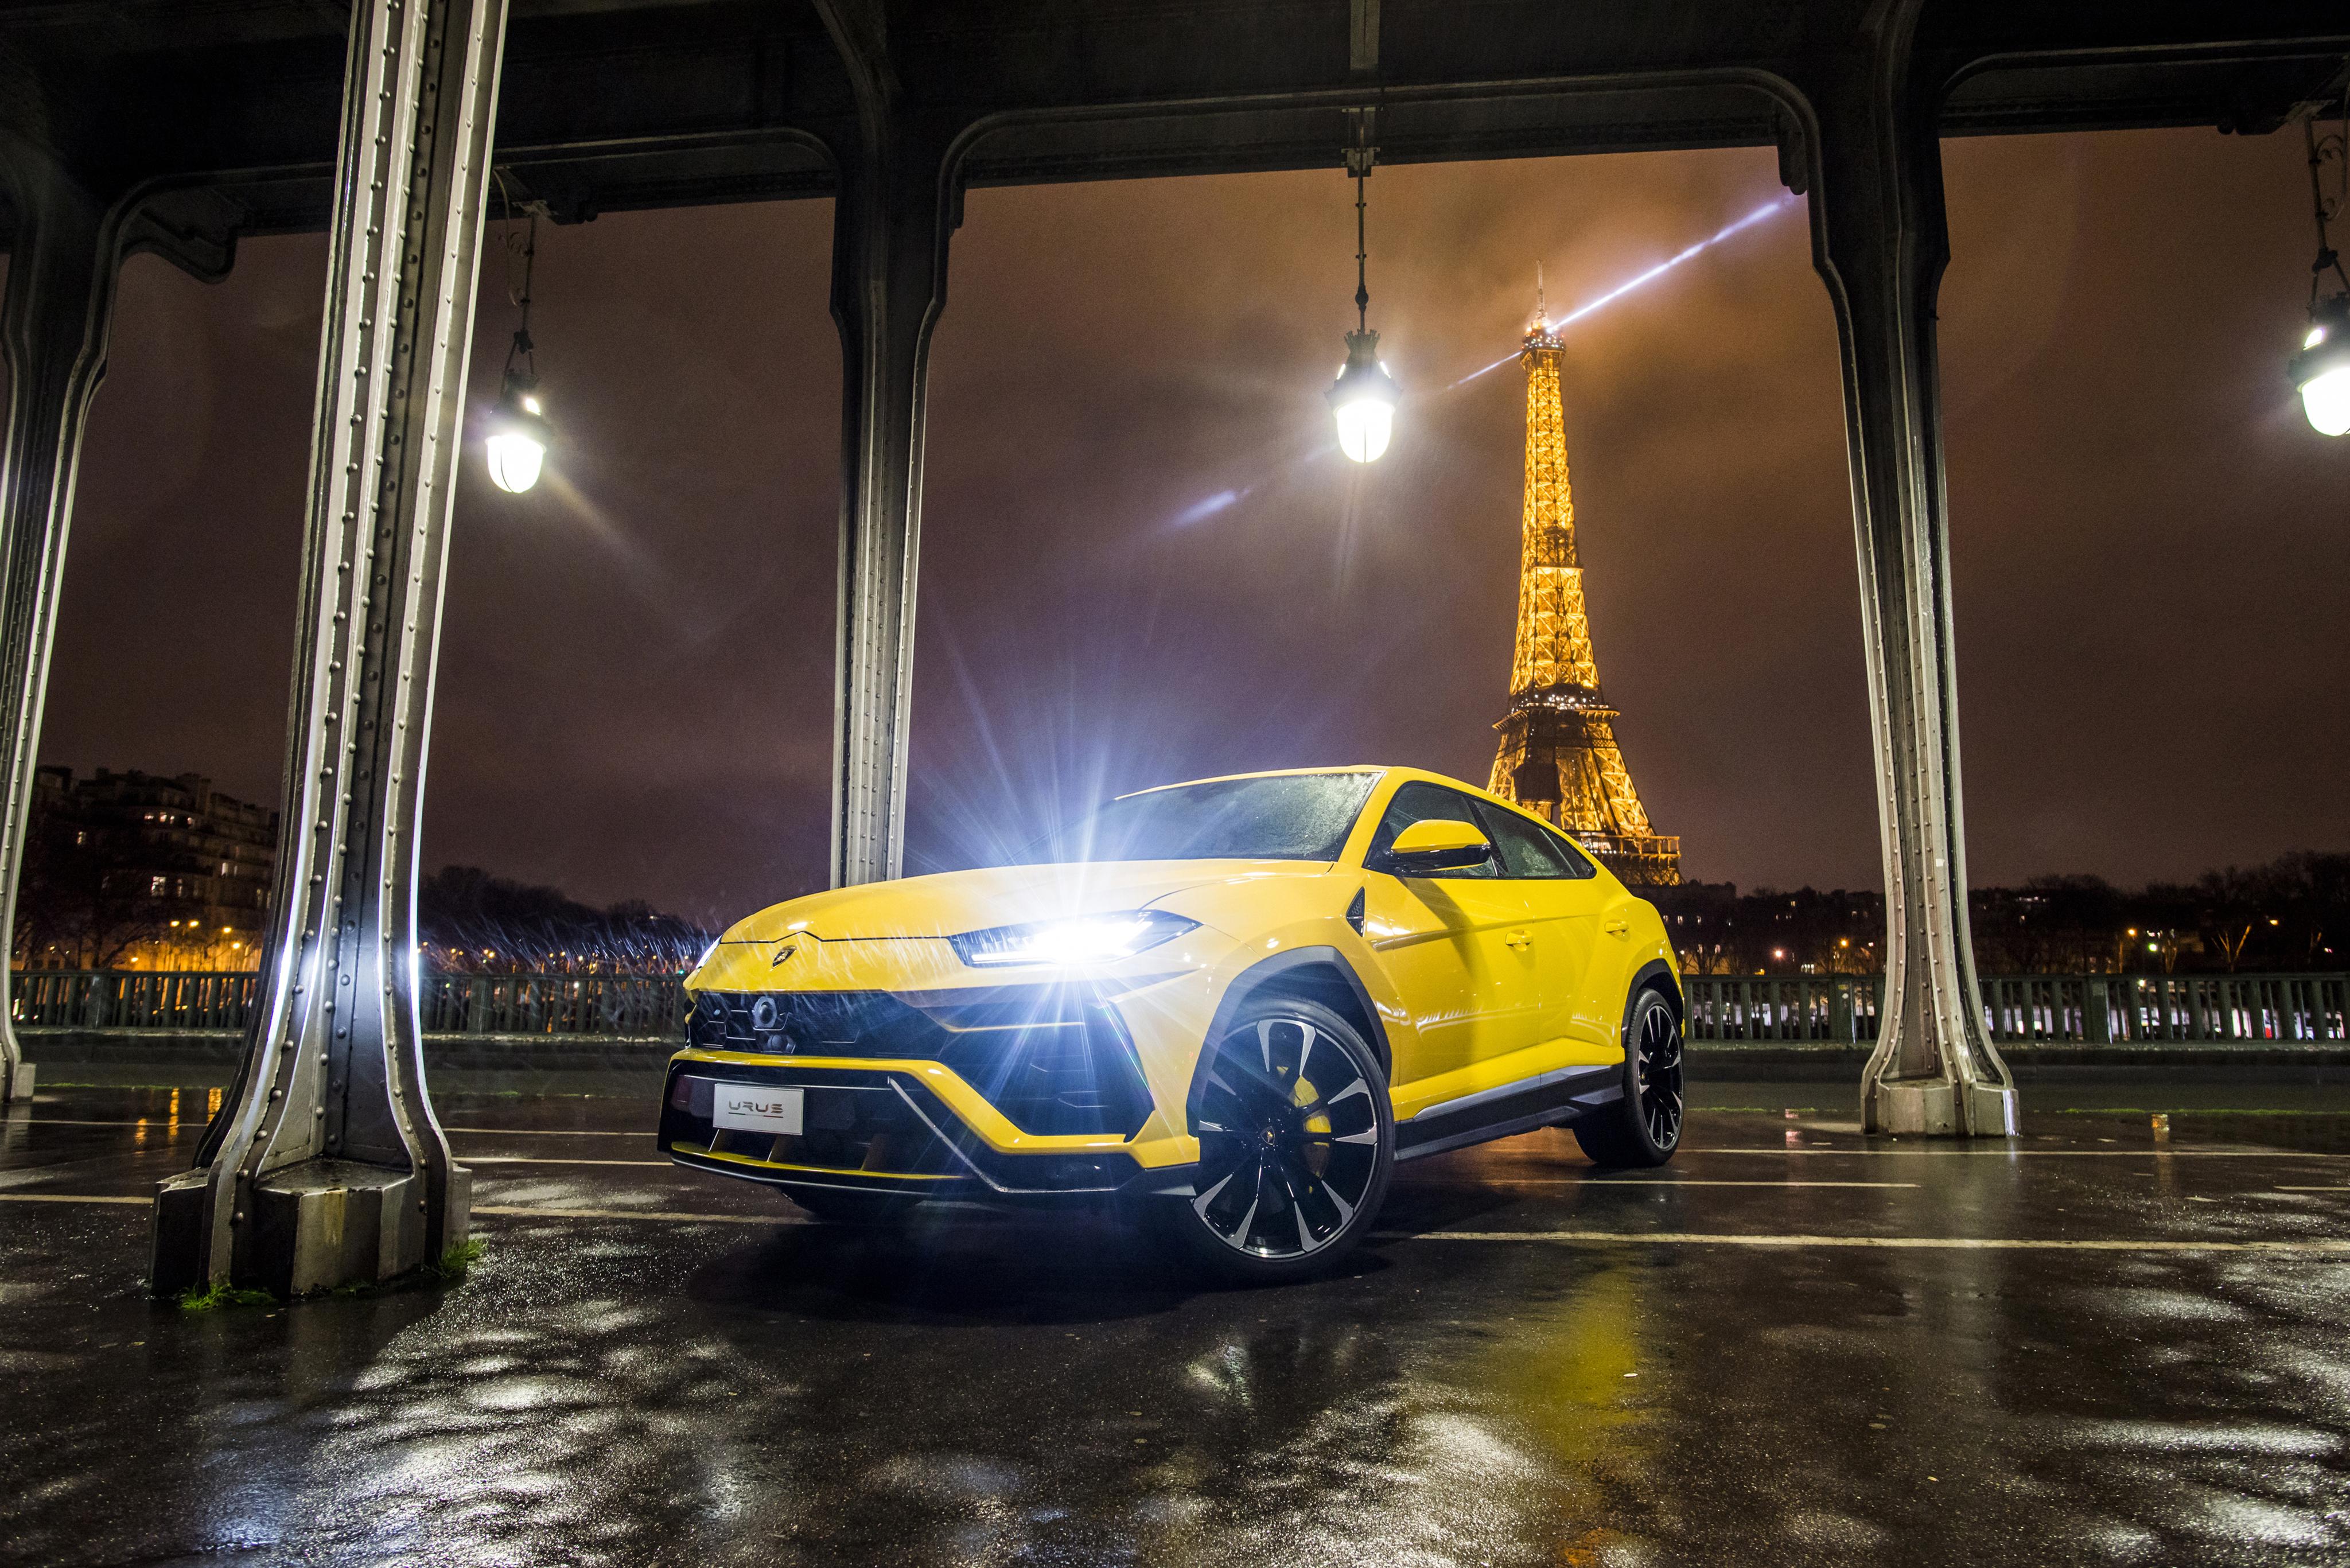 Lamborghini Urus 4k Ultra Hd Wallpaper Background Image